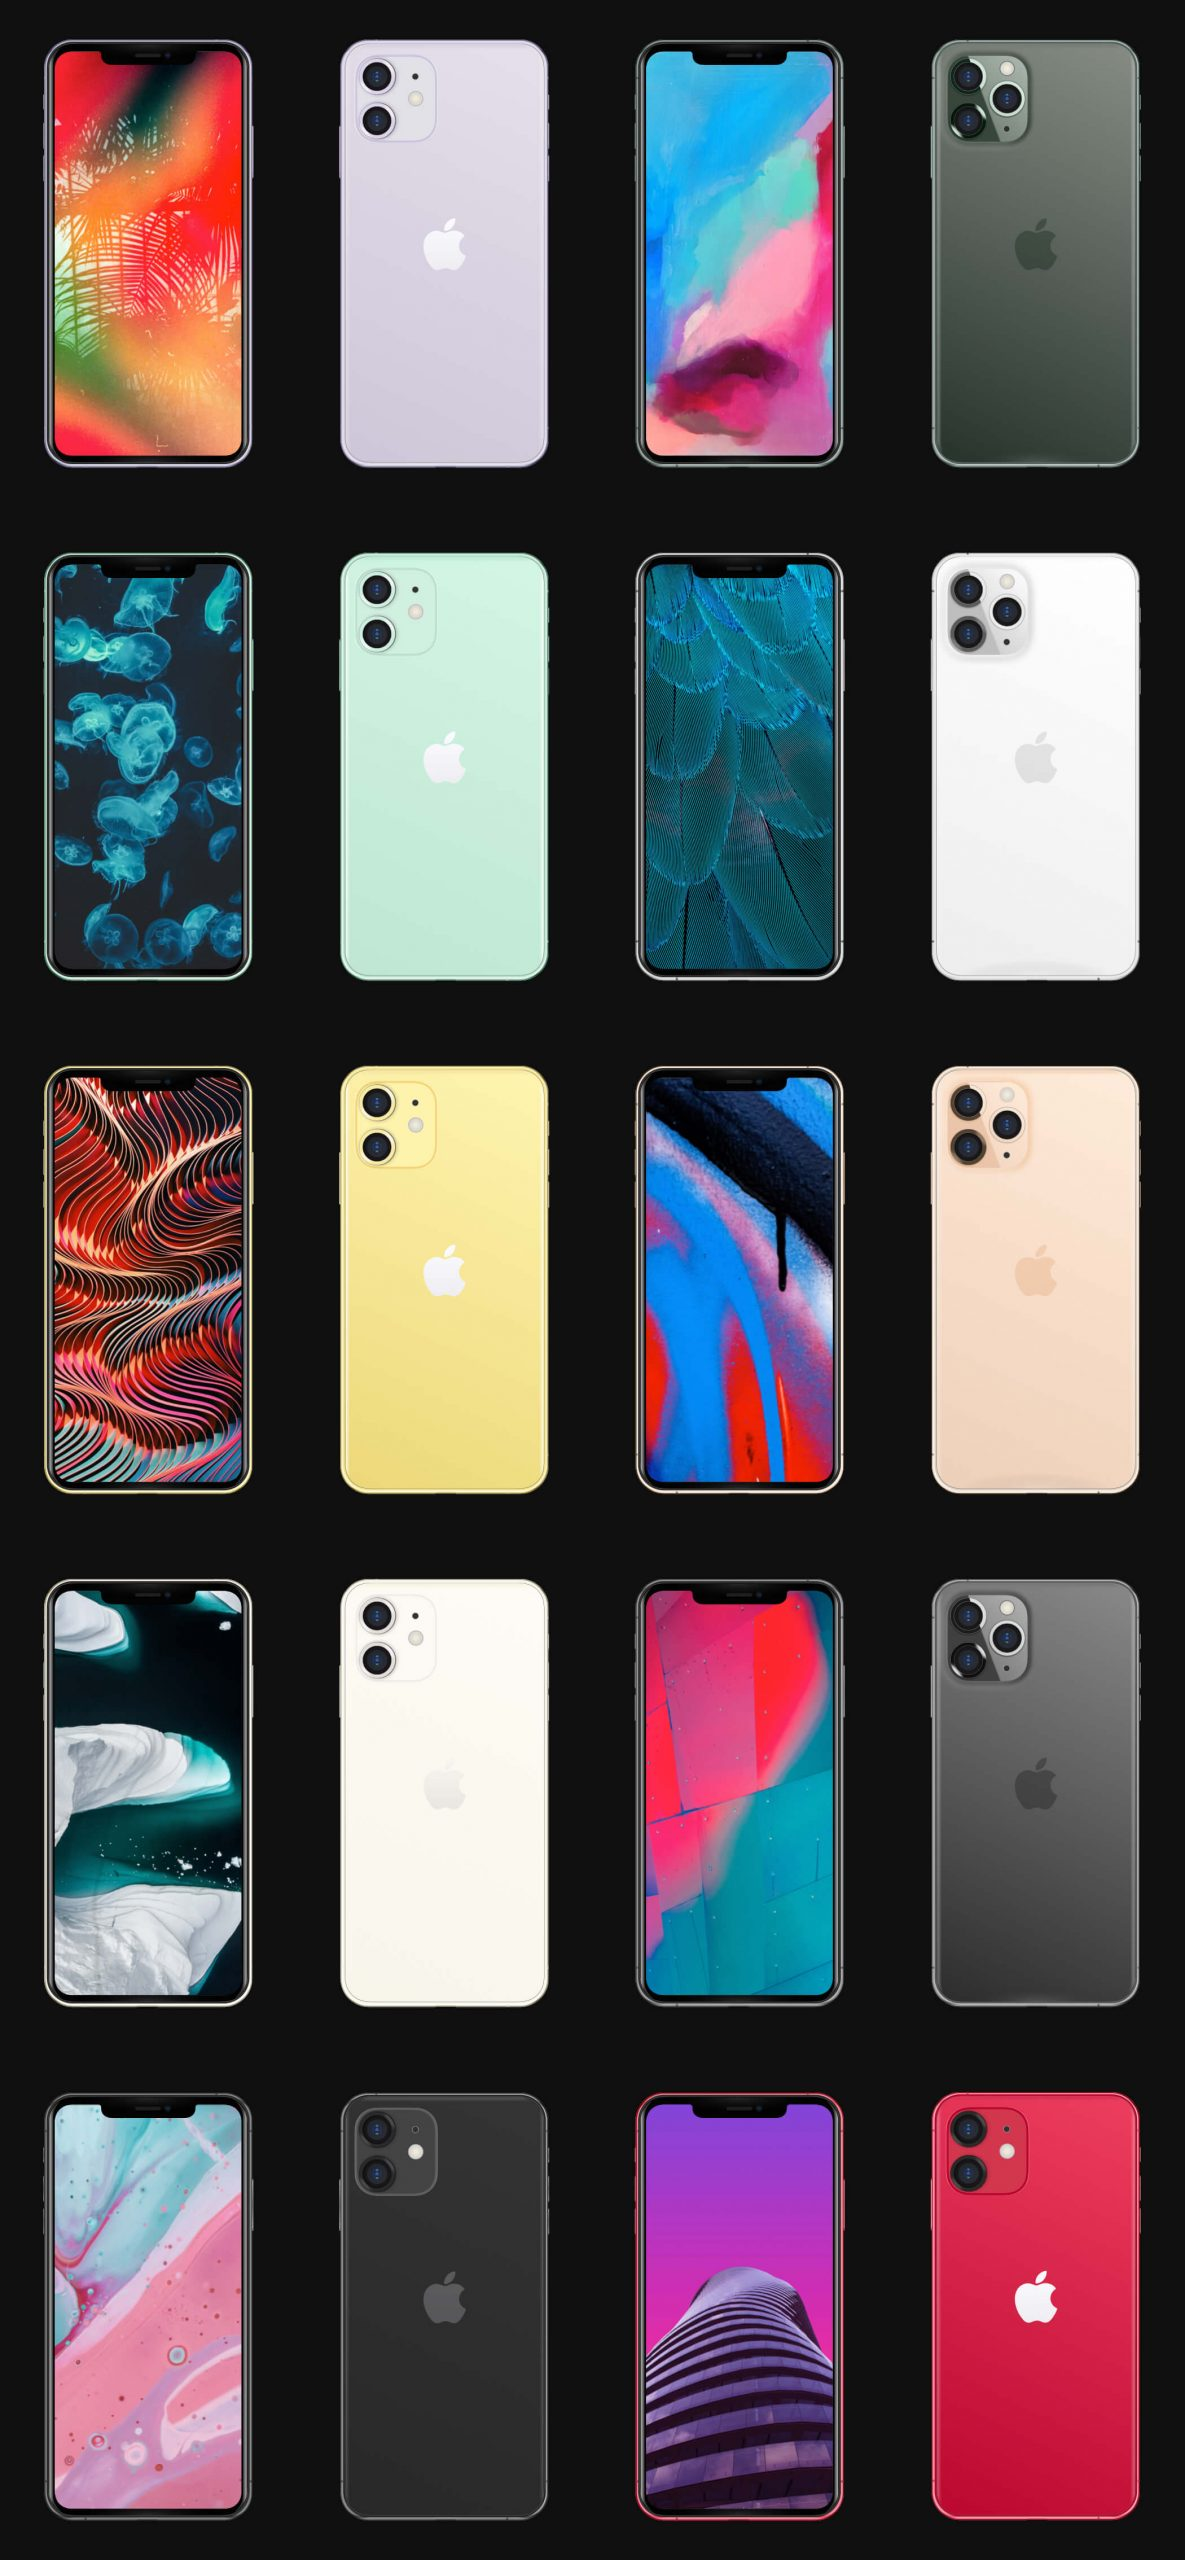 iPhone 11 Pro Max Mockup Free - UI Freebies